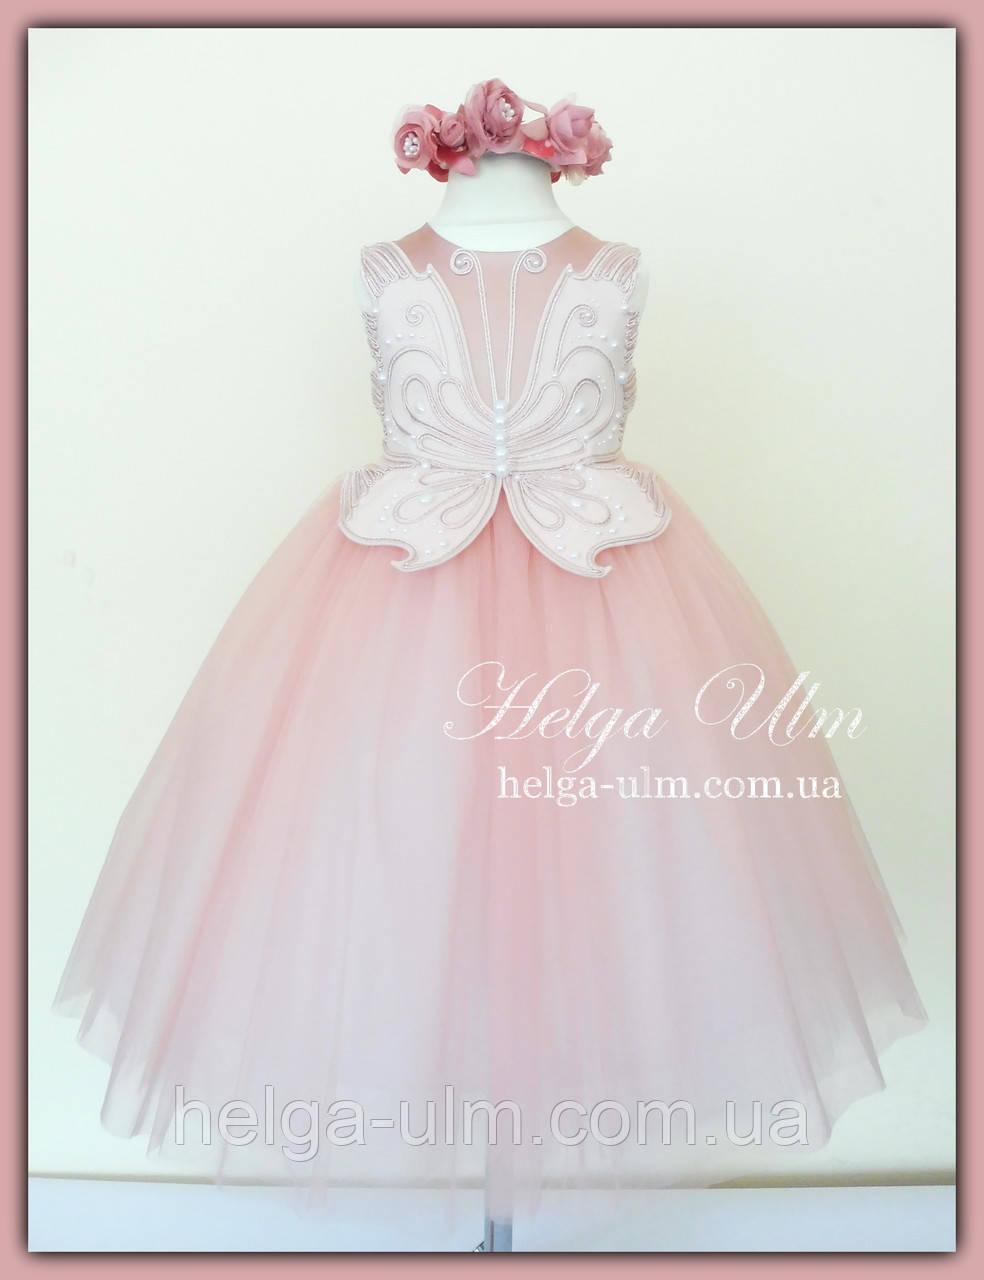 "Пишна бальна сукня для дівчинки ""Метелик"" - РУЧНА РОБОТА! 134 р."